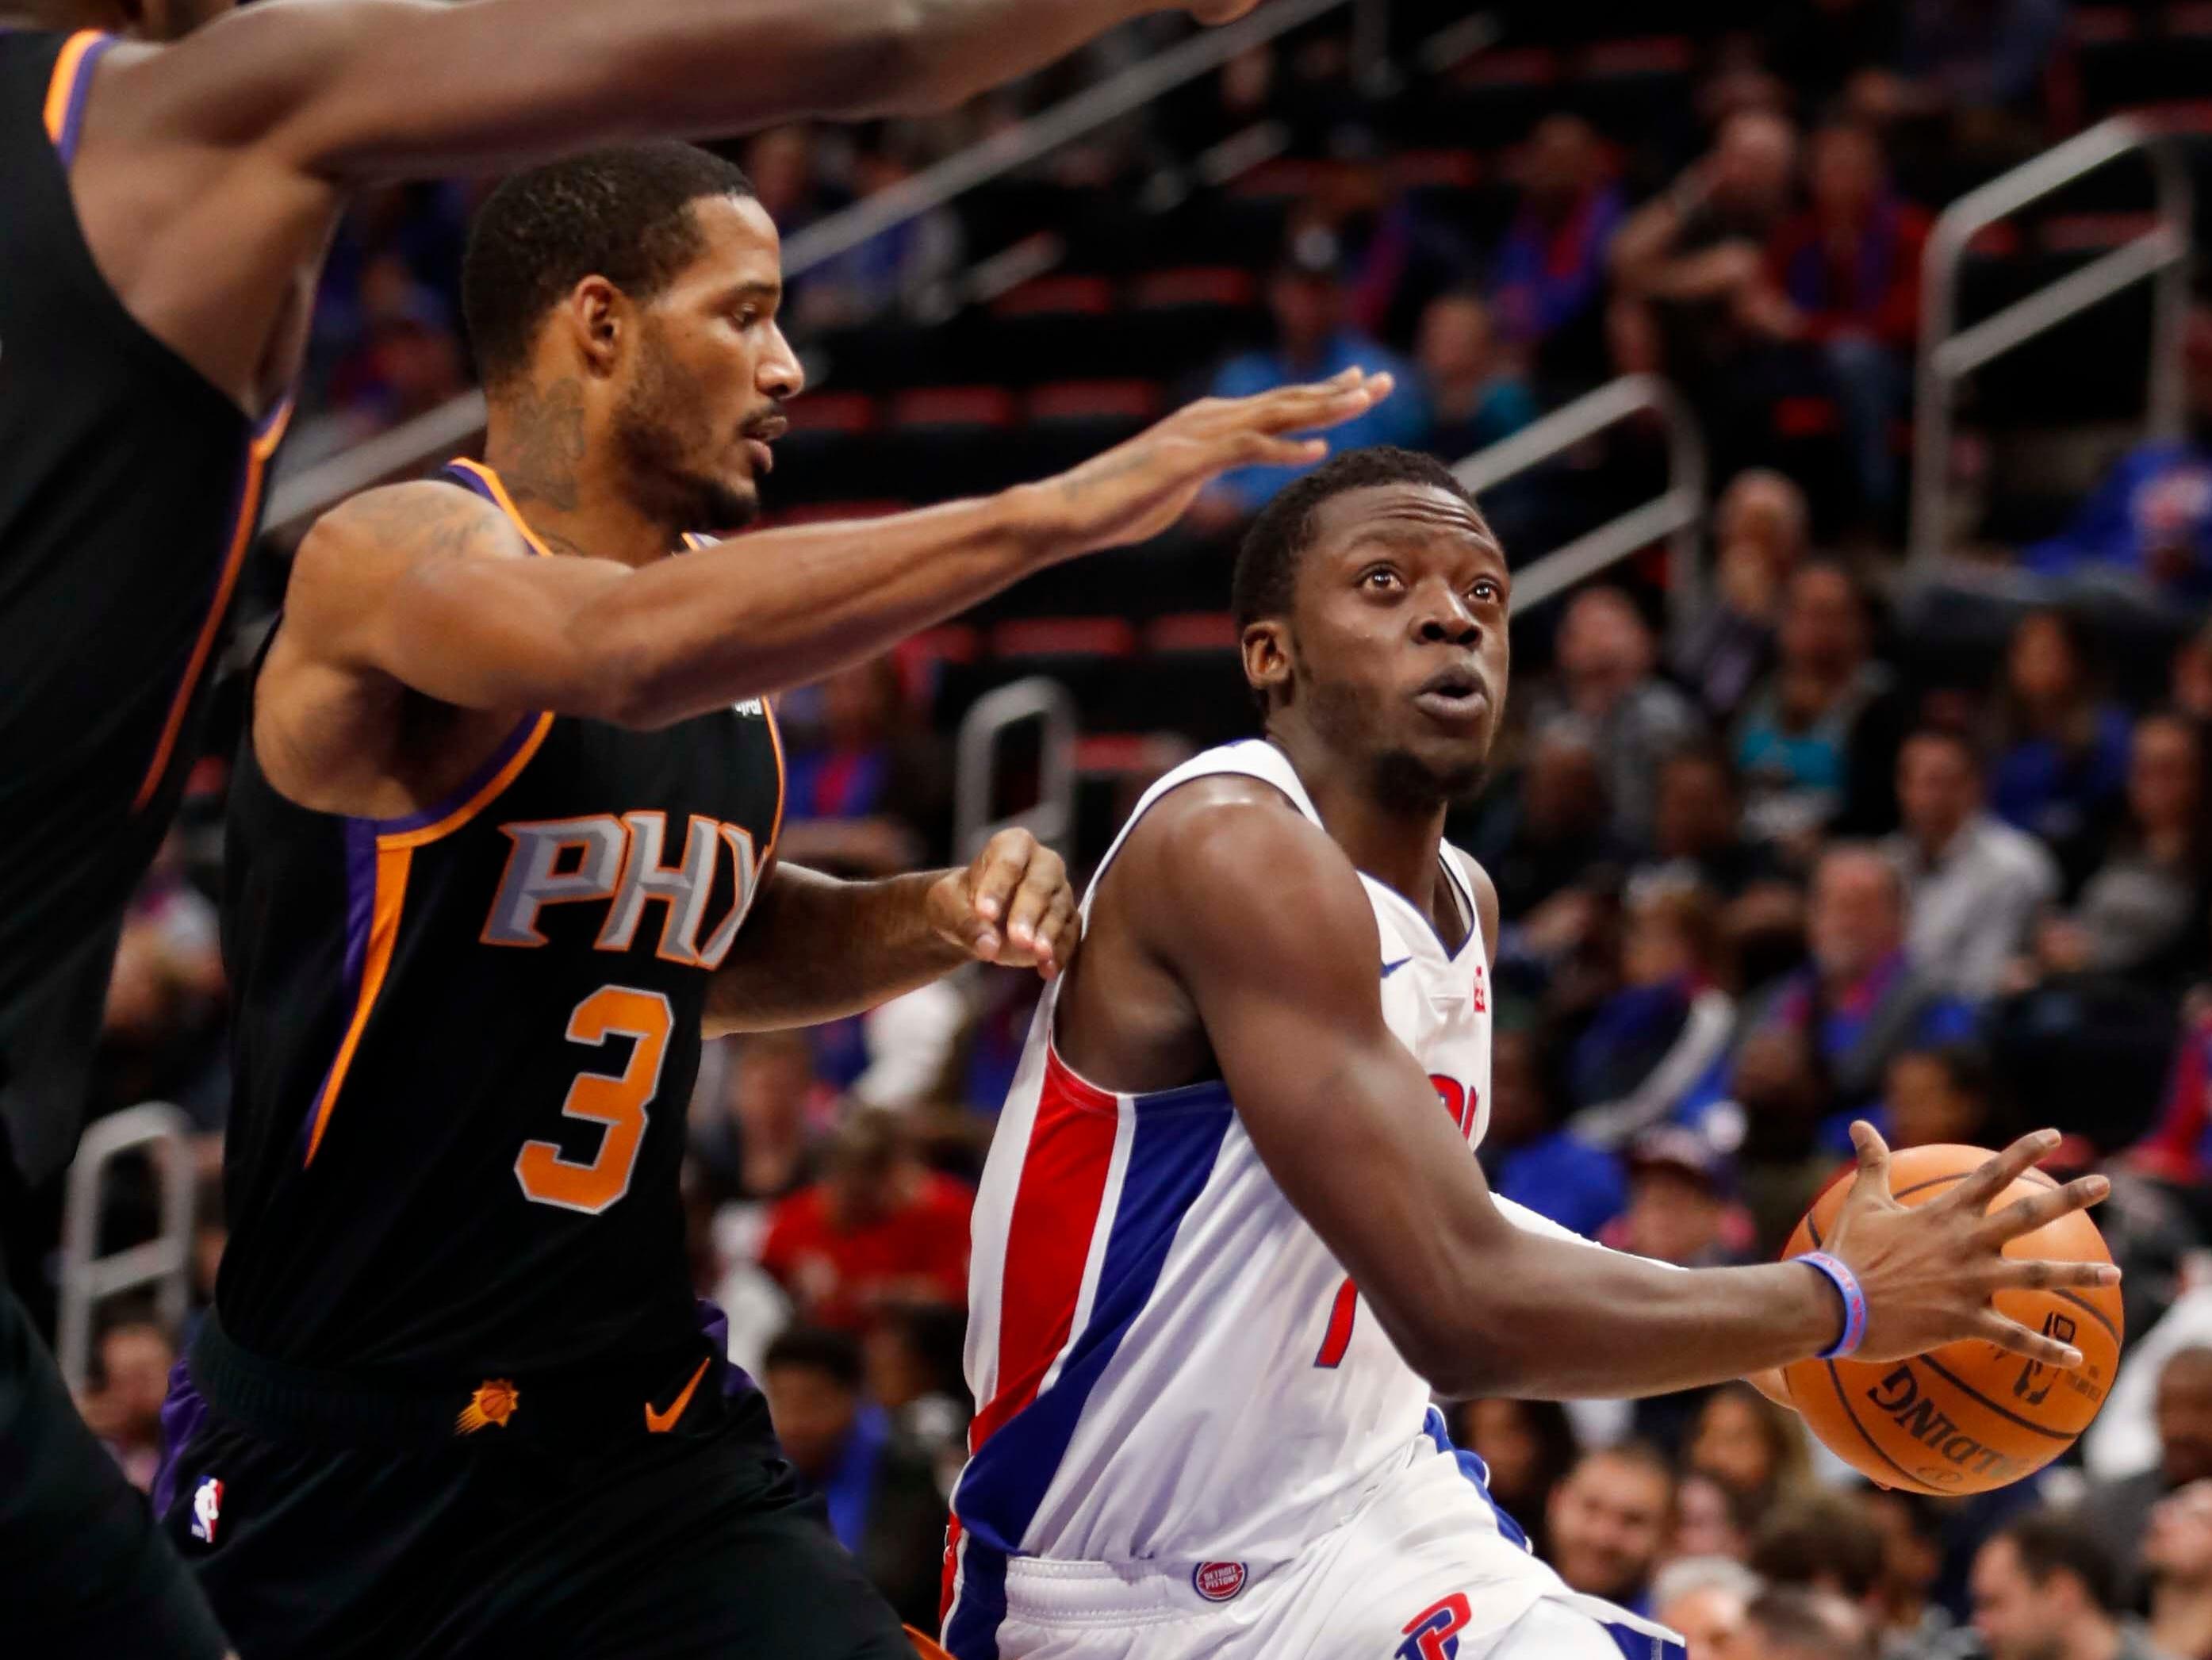 Nov 25, 2018; Detroit, MI, USA; Detroit Pistons guard Reggie Jackson (1) gets defended by Phoenix Suns forward Trevor Ariza (3) during the second quarter at Little Caesars Arena. Mandatory Credit: Raj Mehta-USA TODAY Sports